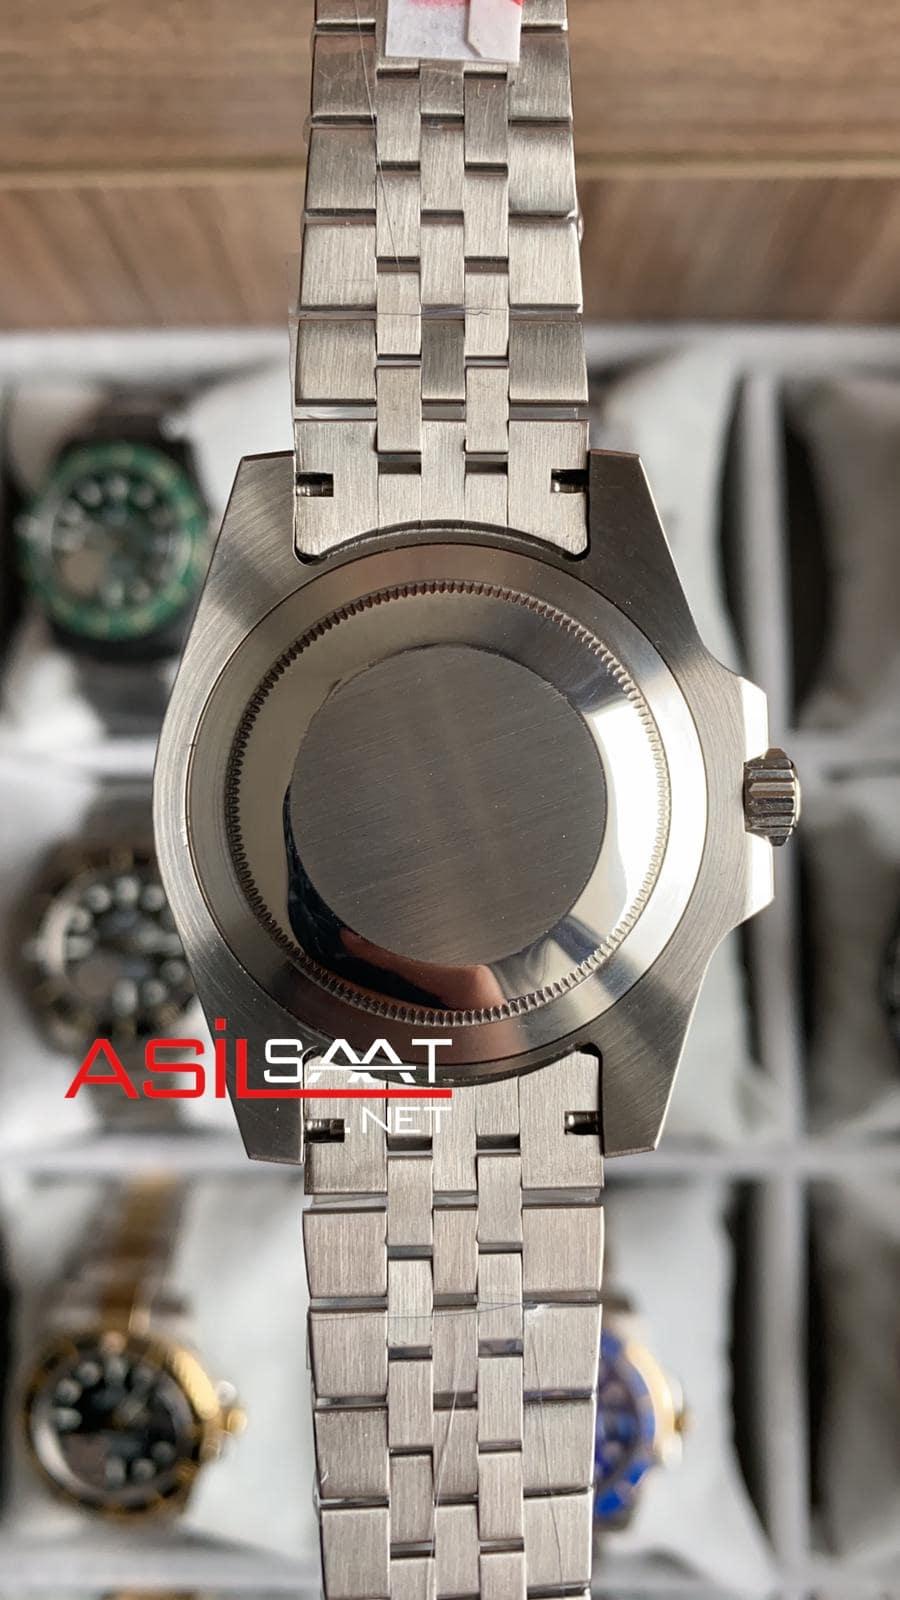 Rolex Jubilee Oyster Perpetual Gmt Master II Sprite Silver Replika Saat ROLG018